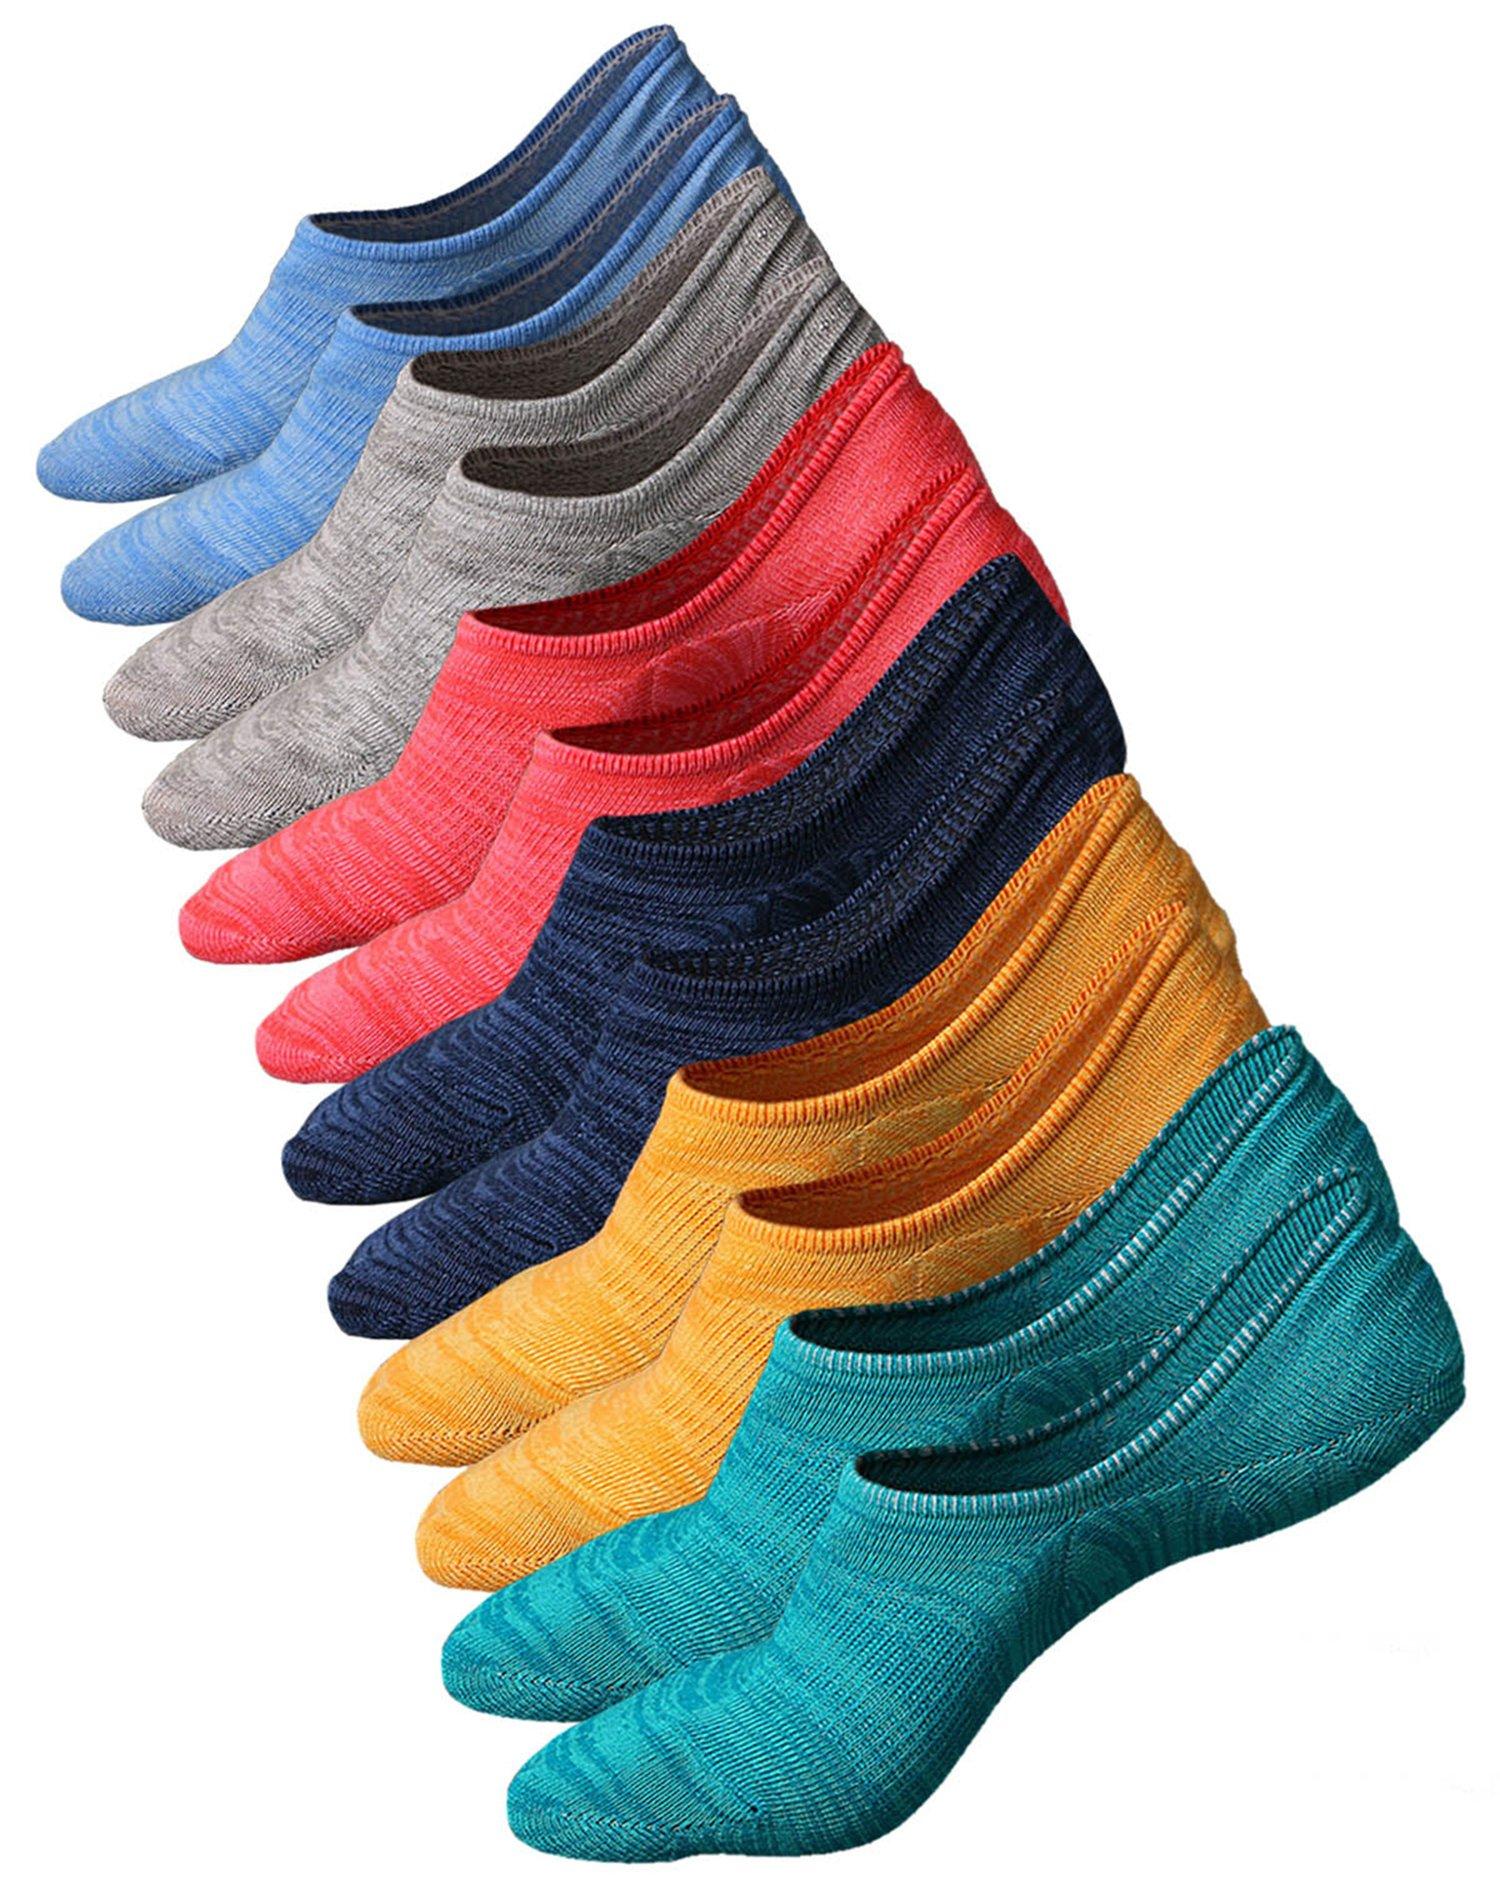 Women's Cotton Low Cut No Show Casual Ankle Socks Anti-Slip